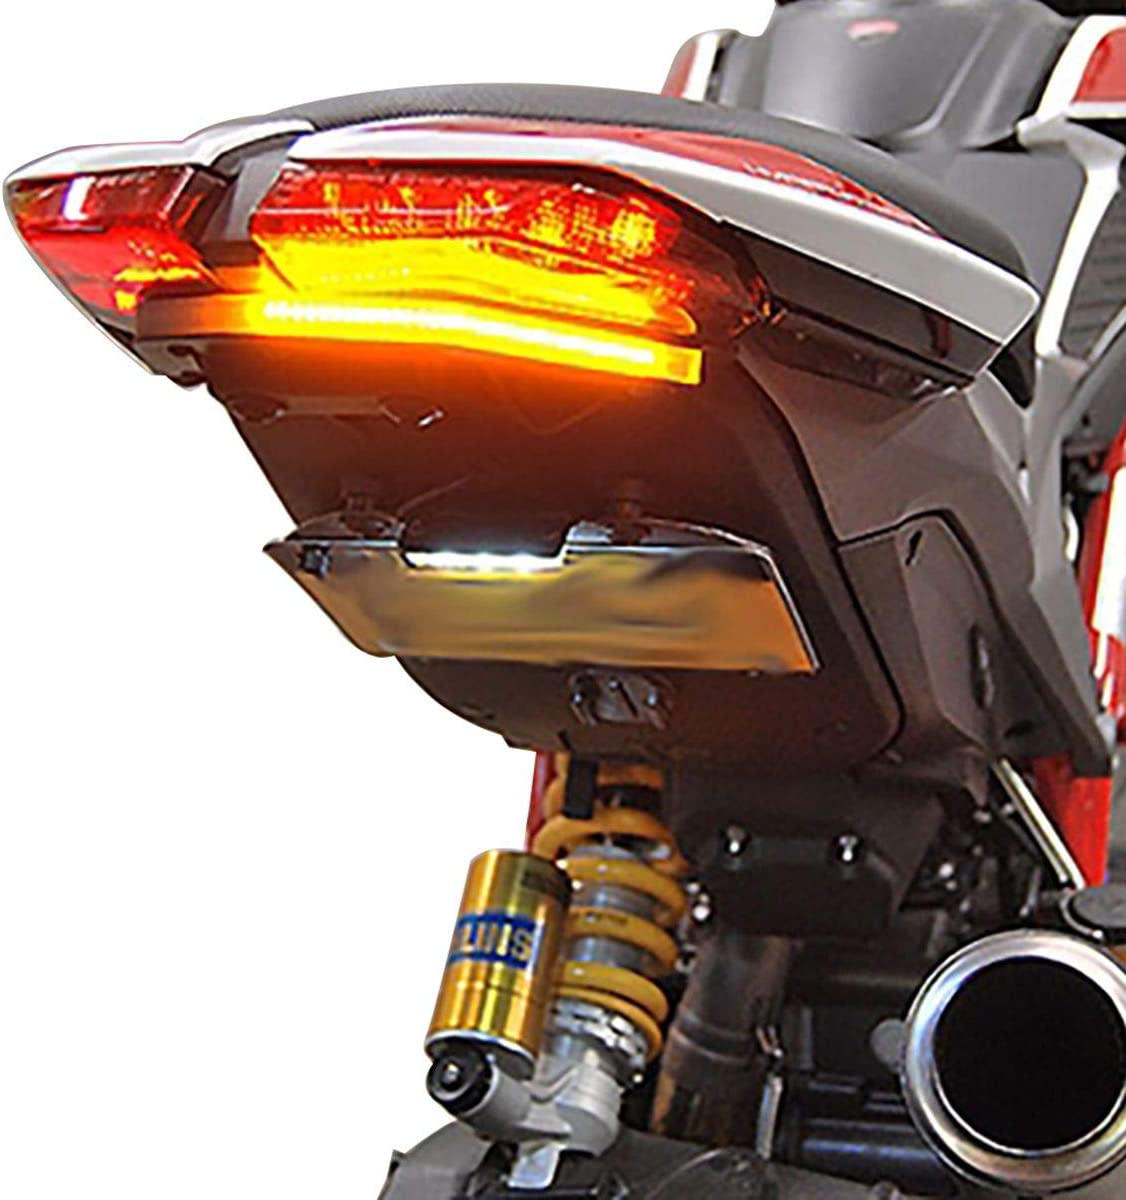 Ducati Hypermotard Fender Eliminator Kit OFFicial Rage New Cyc Fashion - Tucked